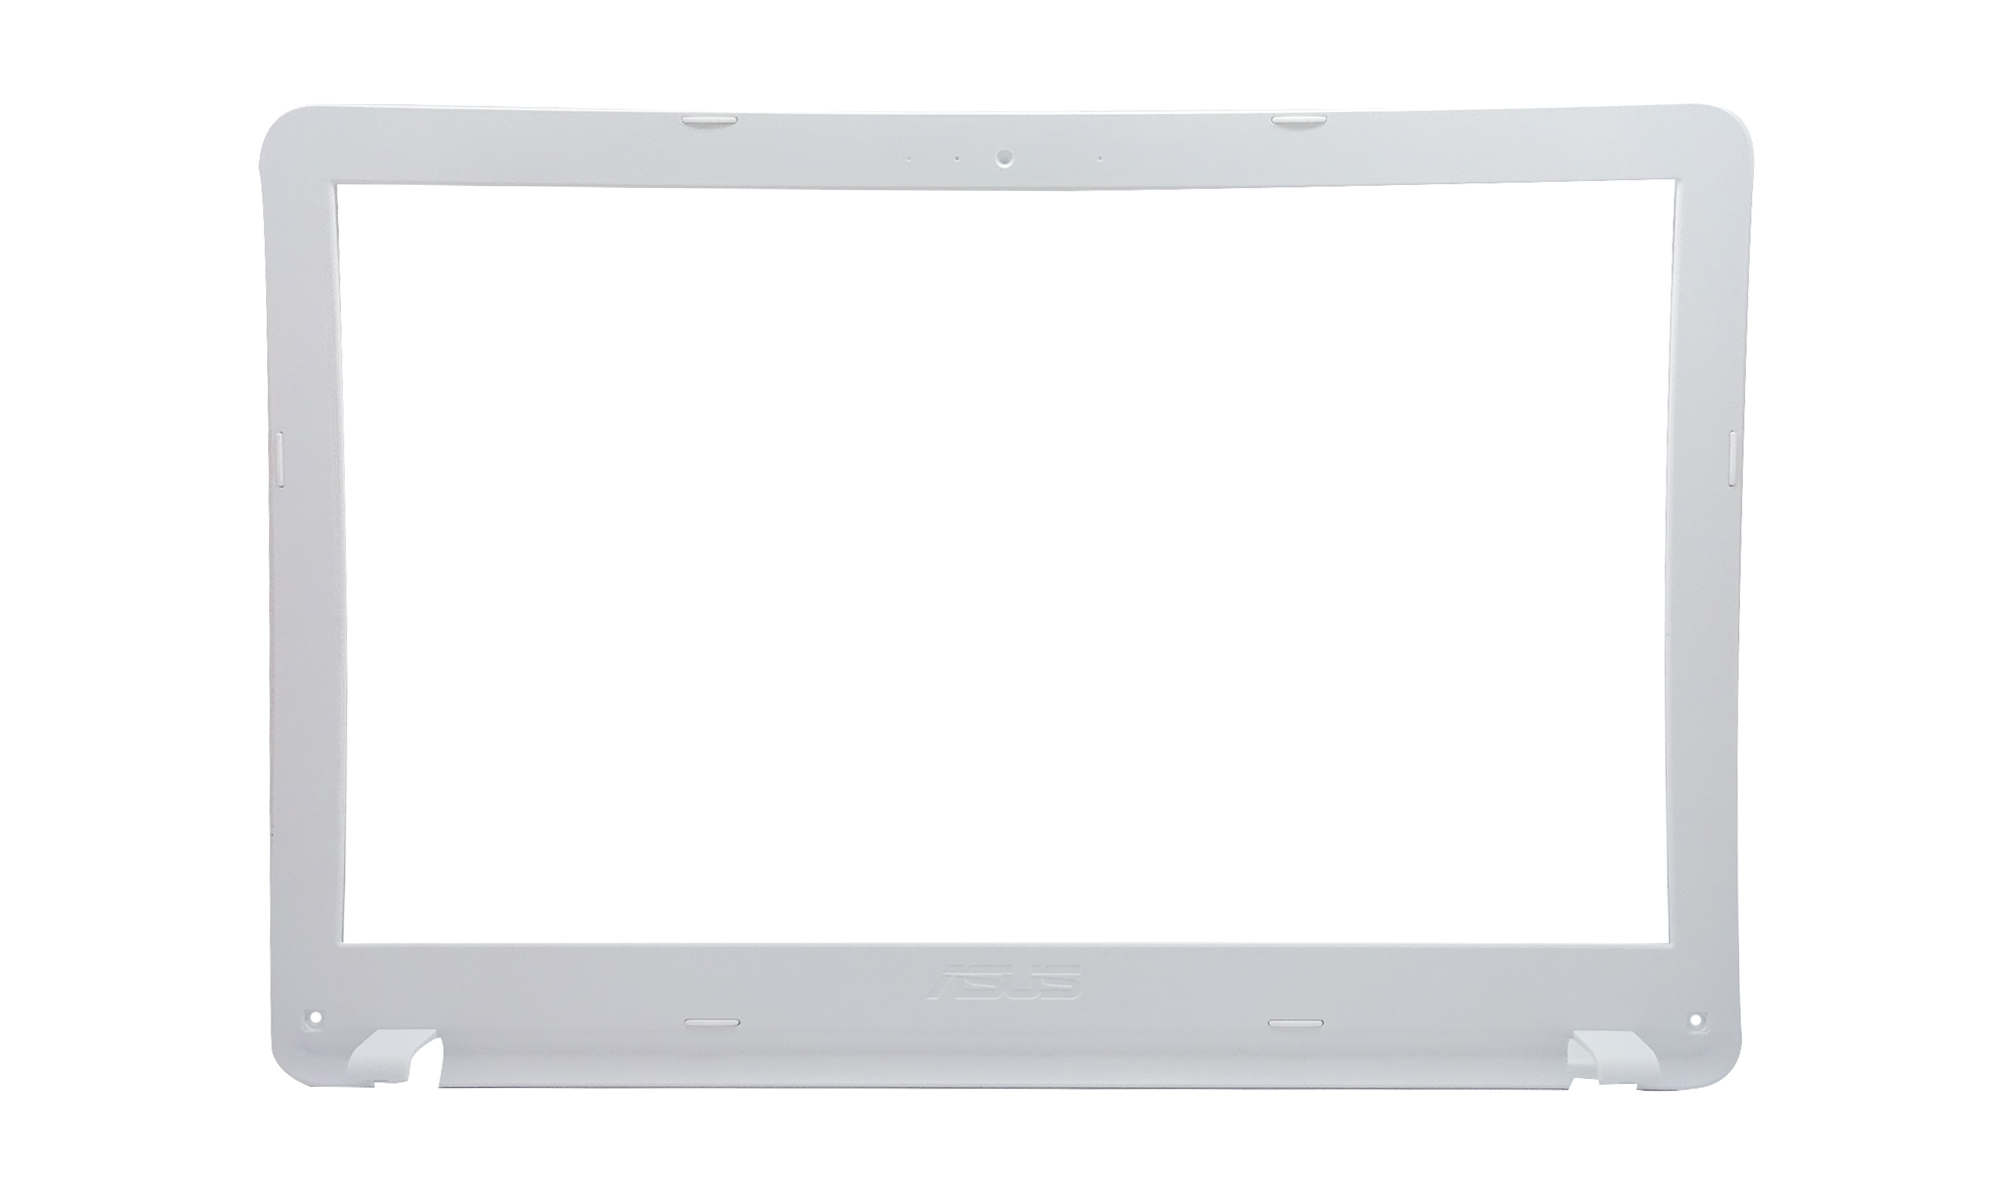 Rama display Asus VivoBook Max D541NA, D541NC, D541SA, D541SC, alba